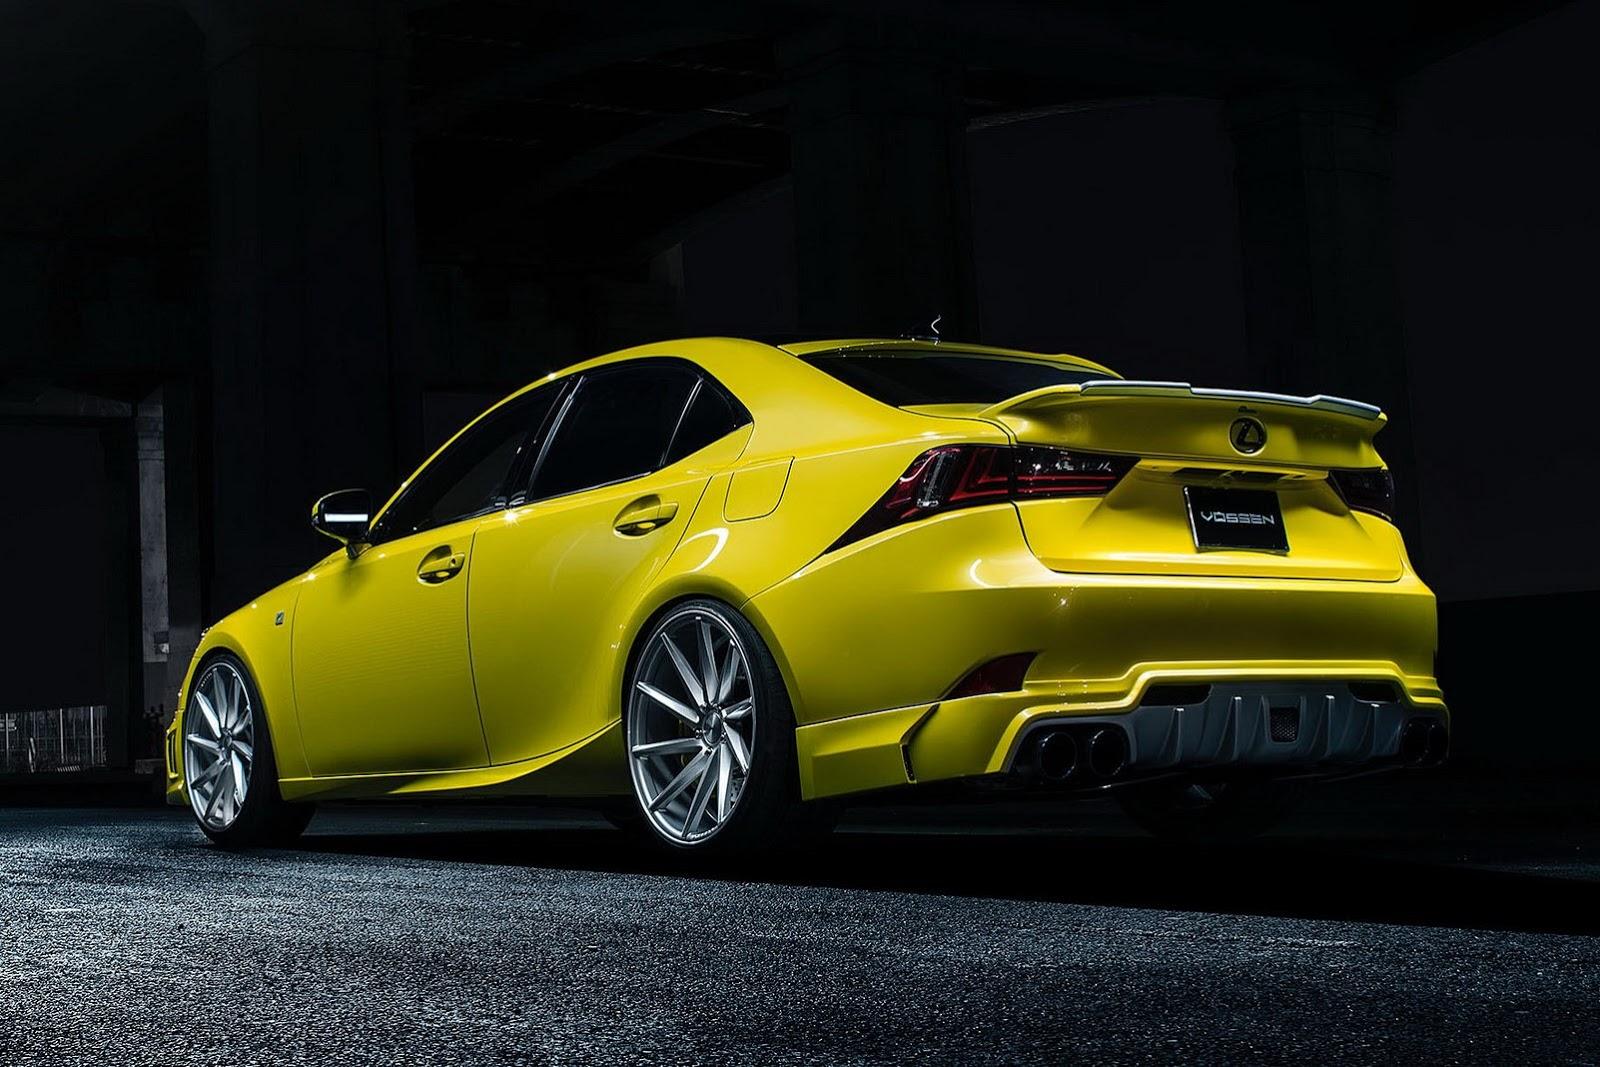 Lexus Cars News Customised Sedans For 2013 Sema Show